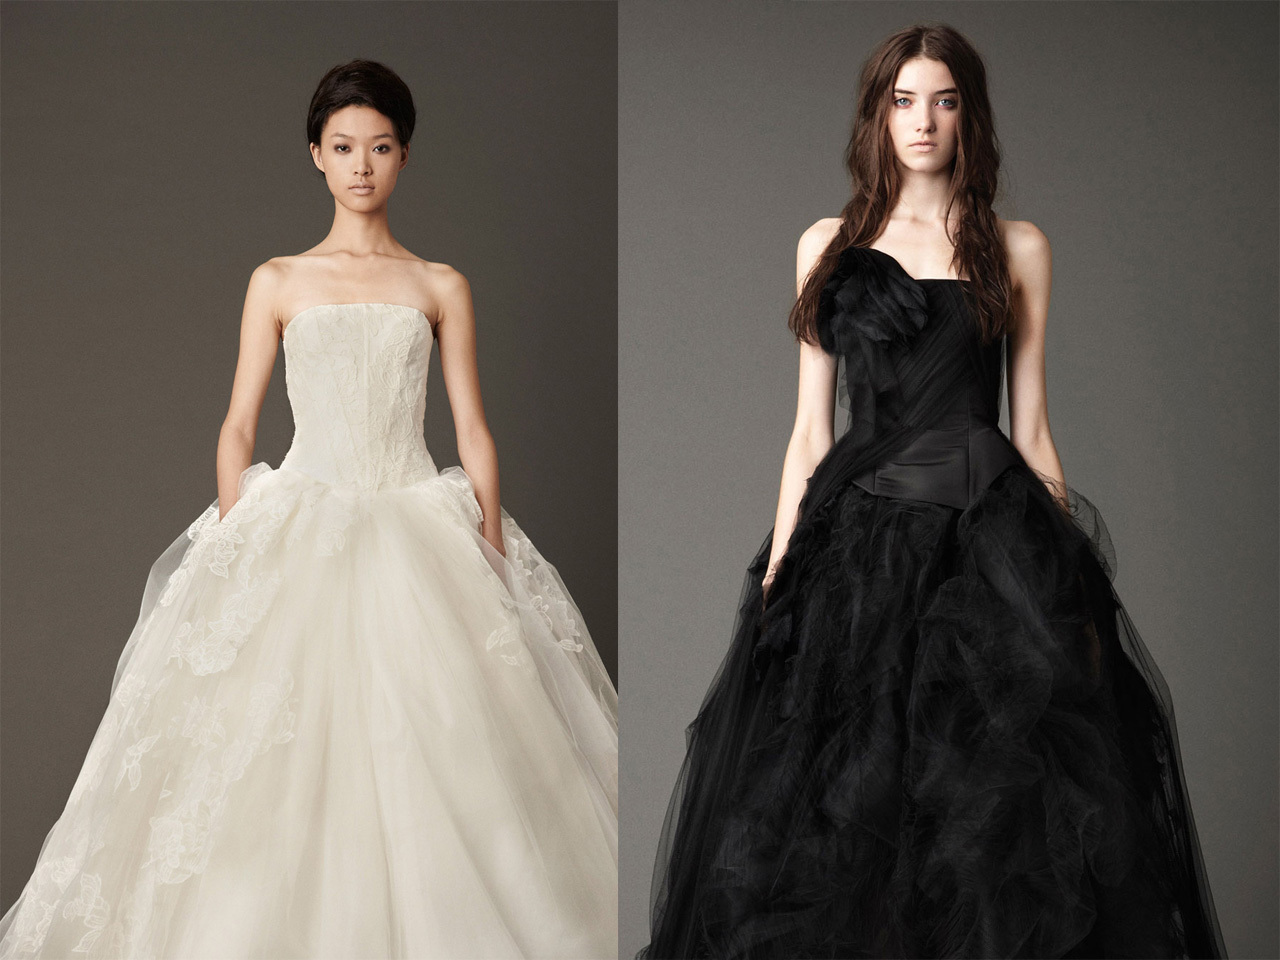 Vera Wang bridals, in black \u0026 white